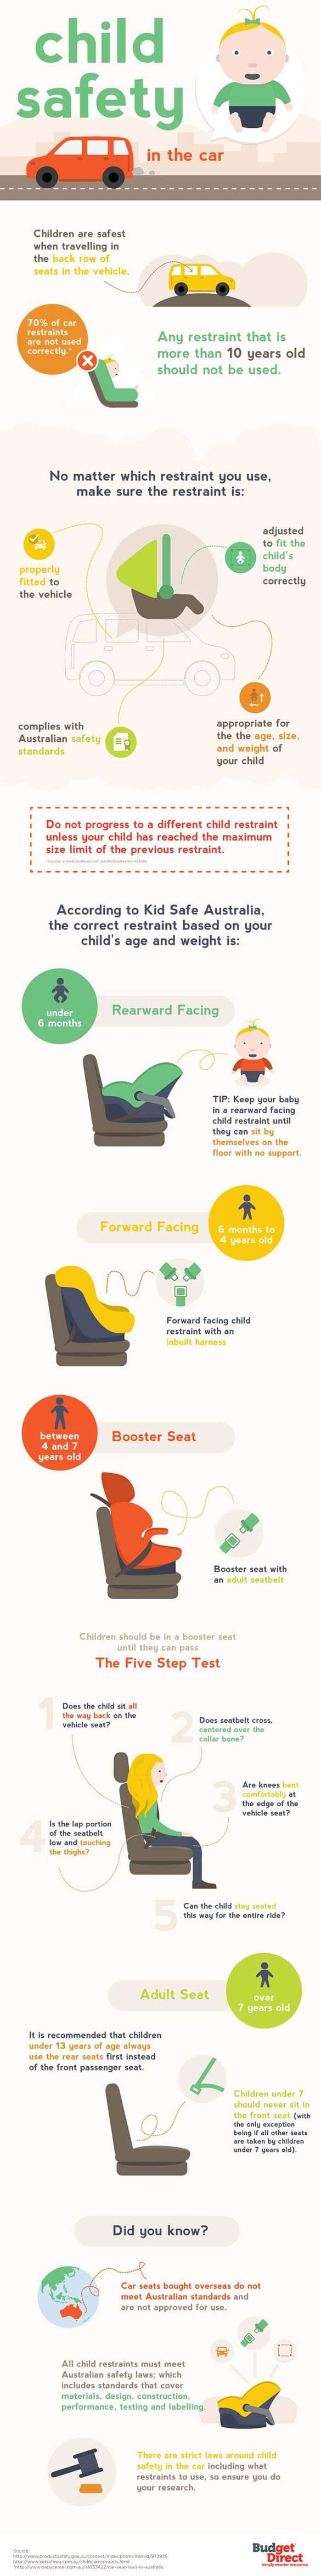 Child-safety-6_mini